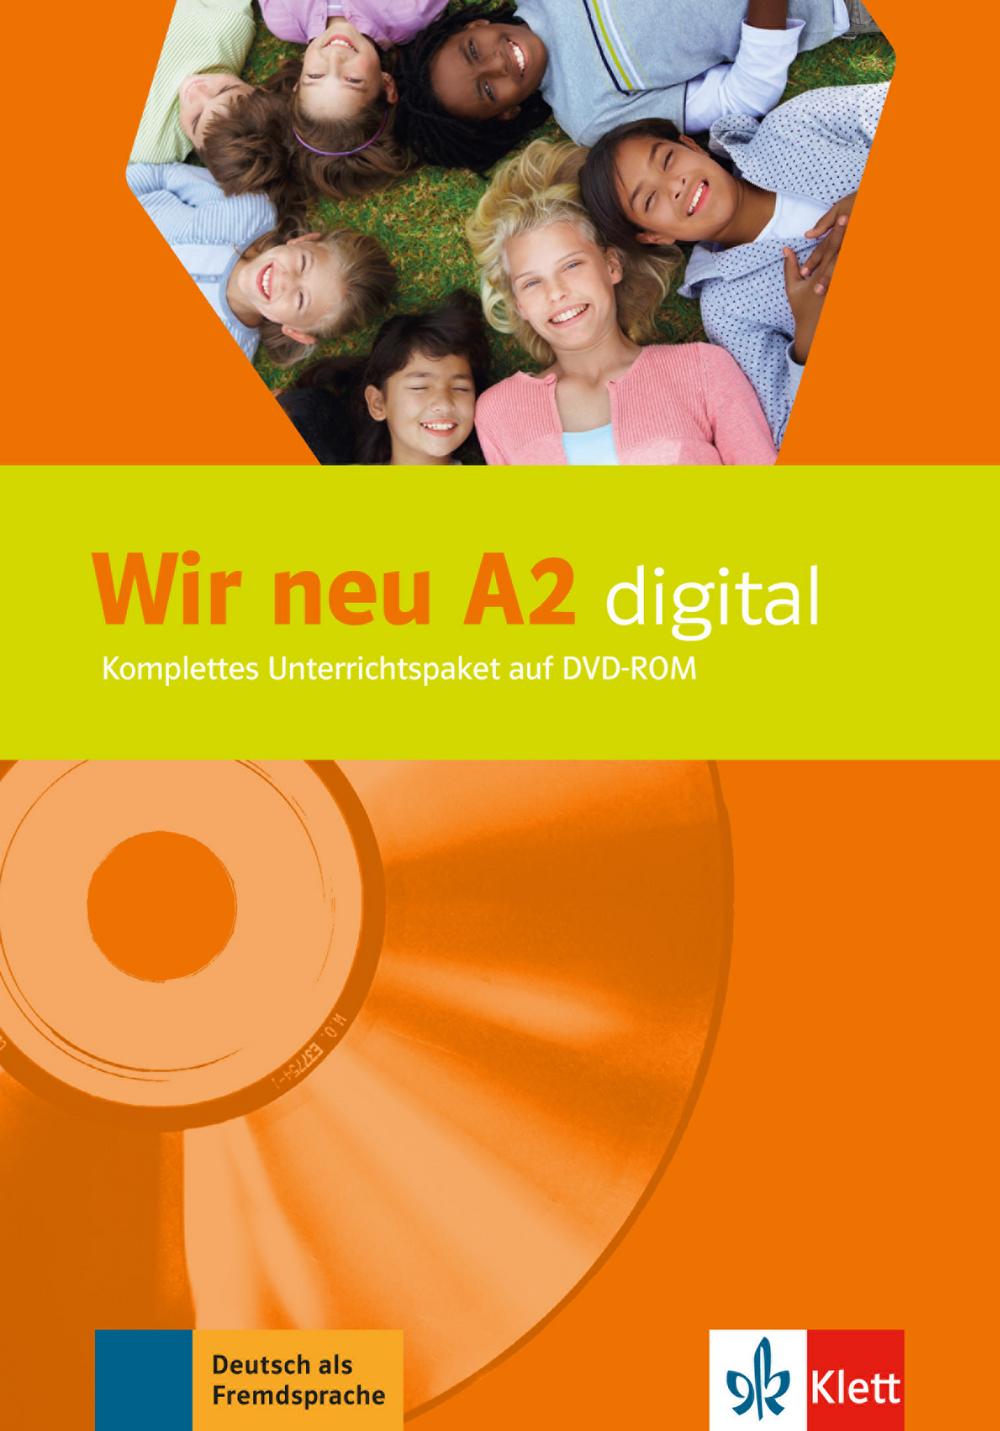 Wir neu A2 digital